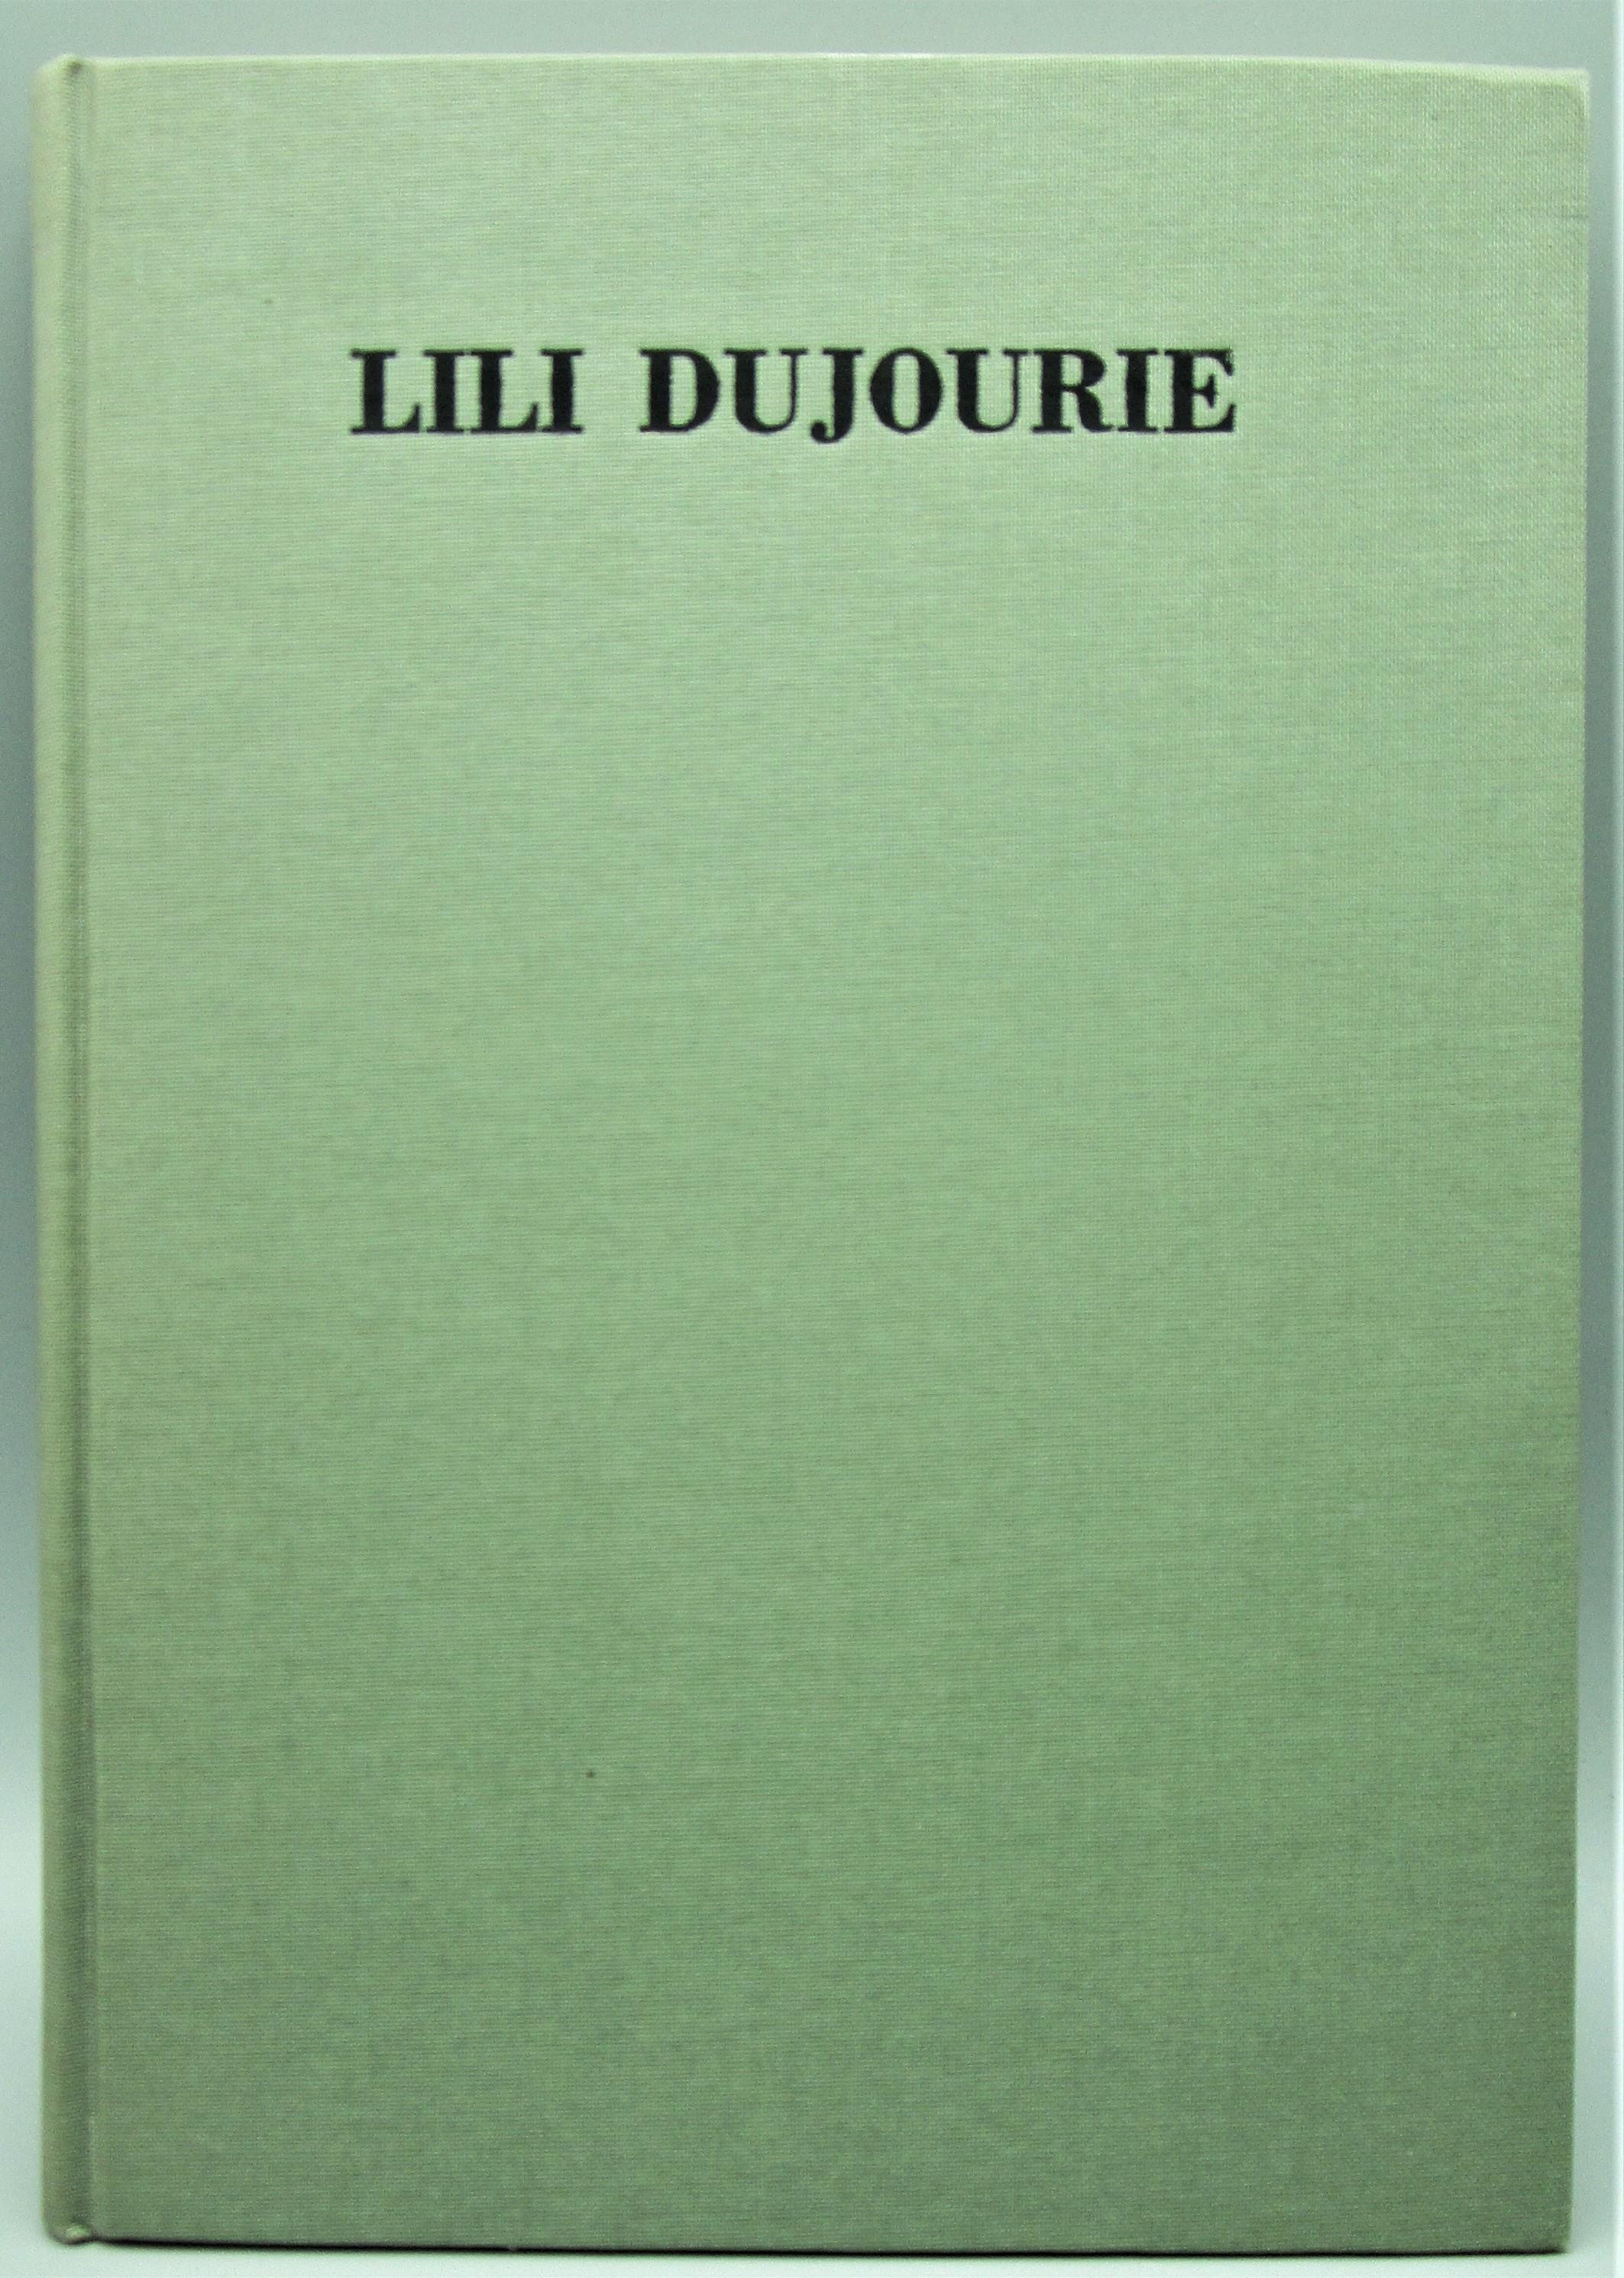 LILI DUJOURIE, by Bart Cassiman; Annelie Pohlen - 1989